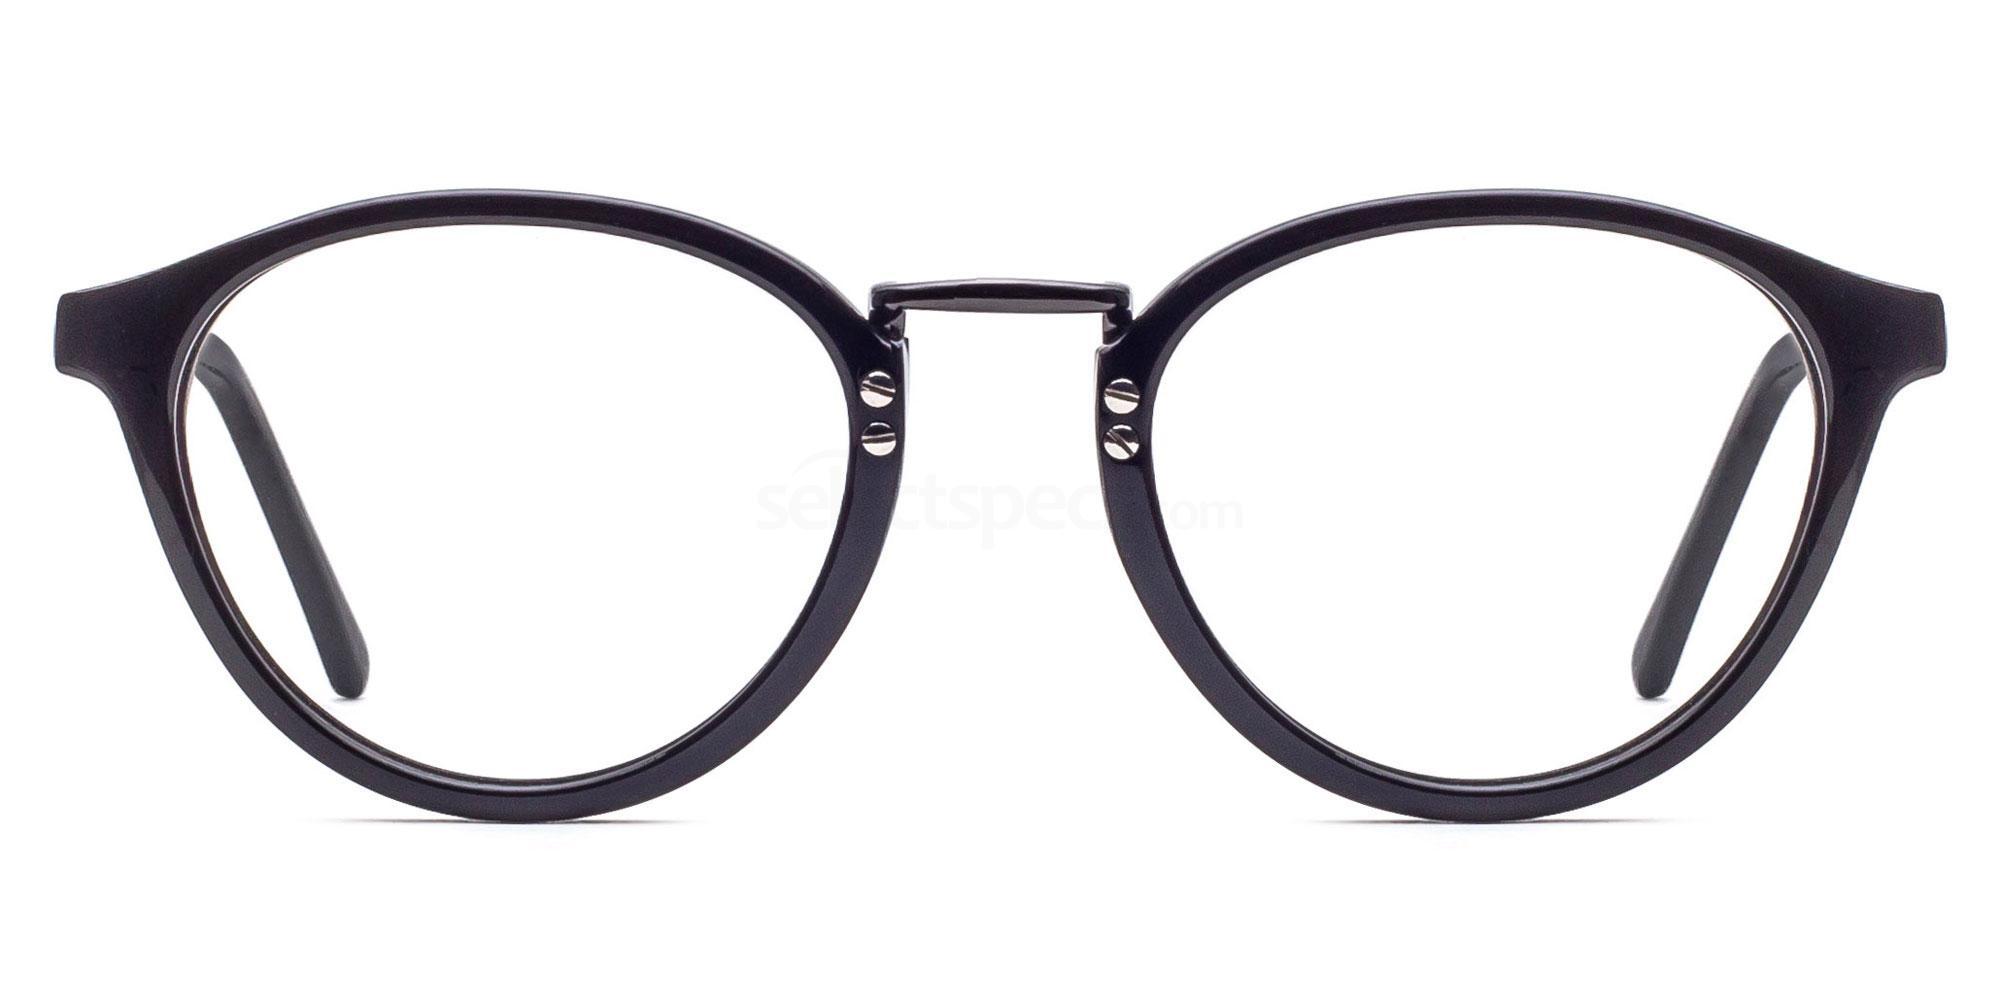 C1 SRA041 Glasses, Infinity